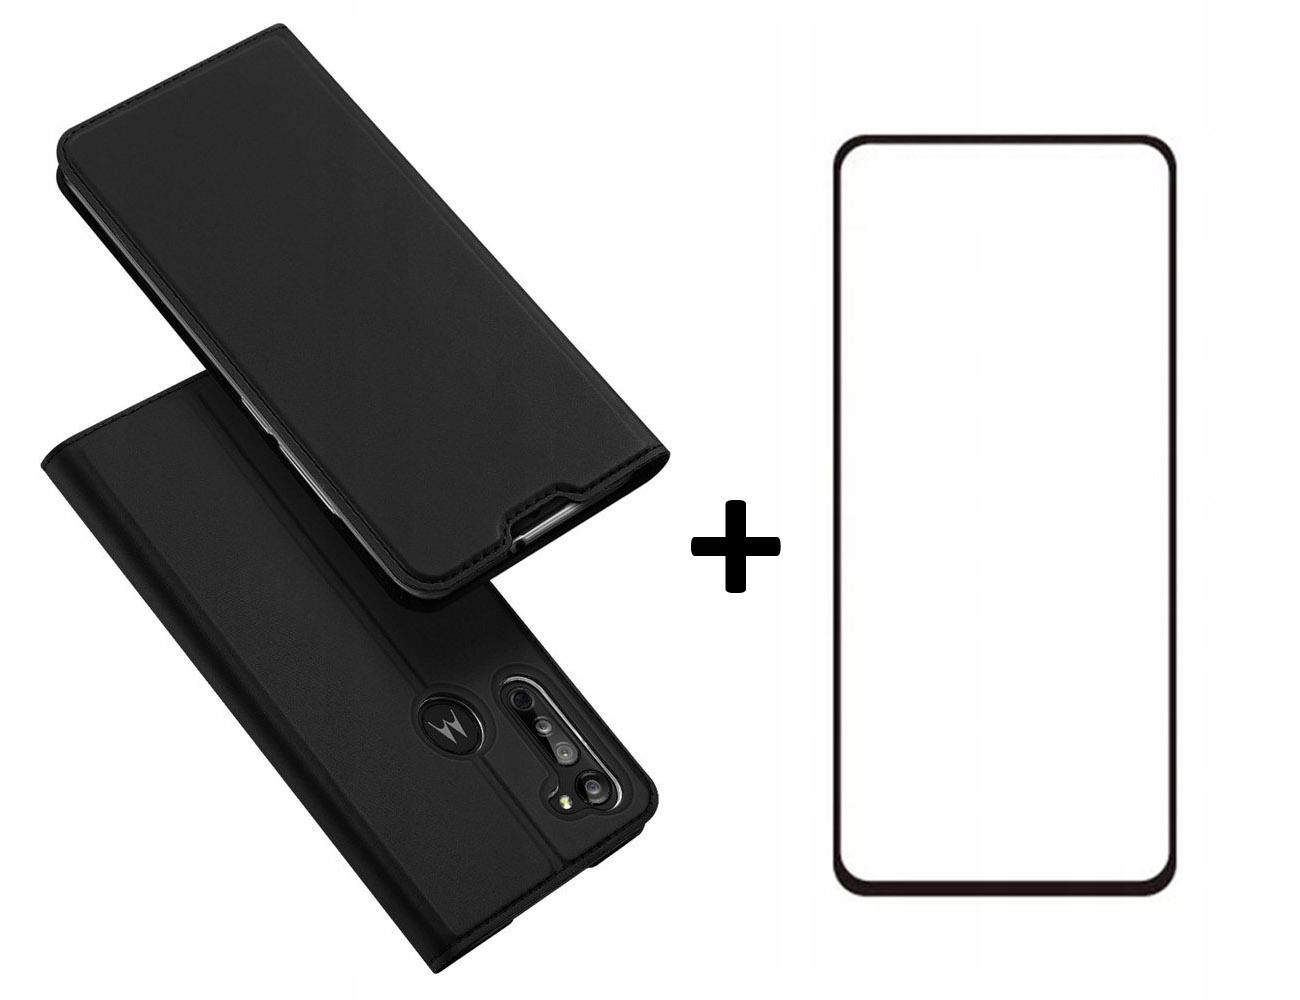 Etui DUX DUCIS + szkło do Motorola Moto G8 czarny